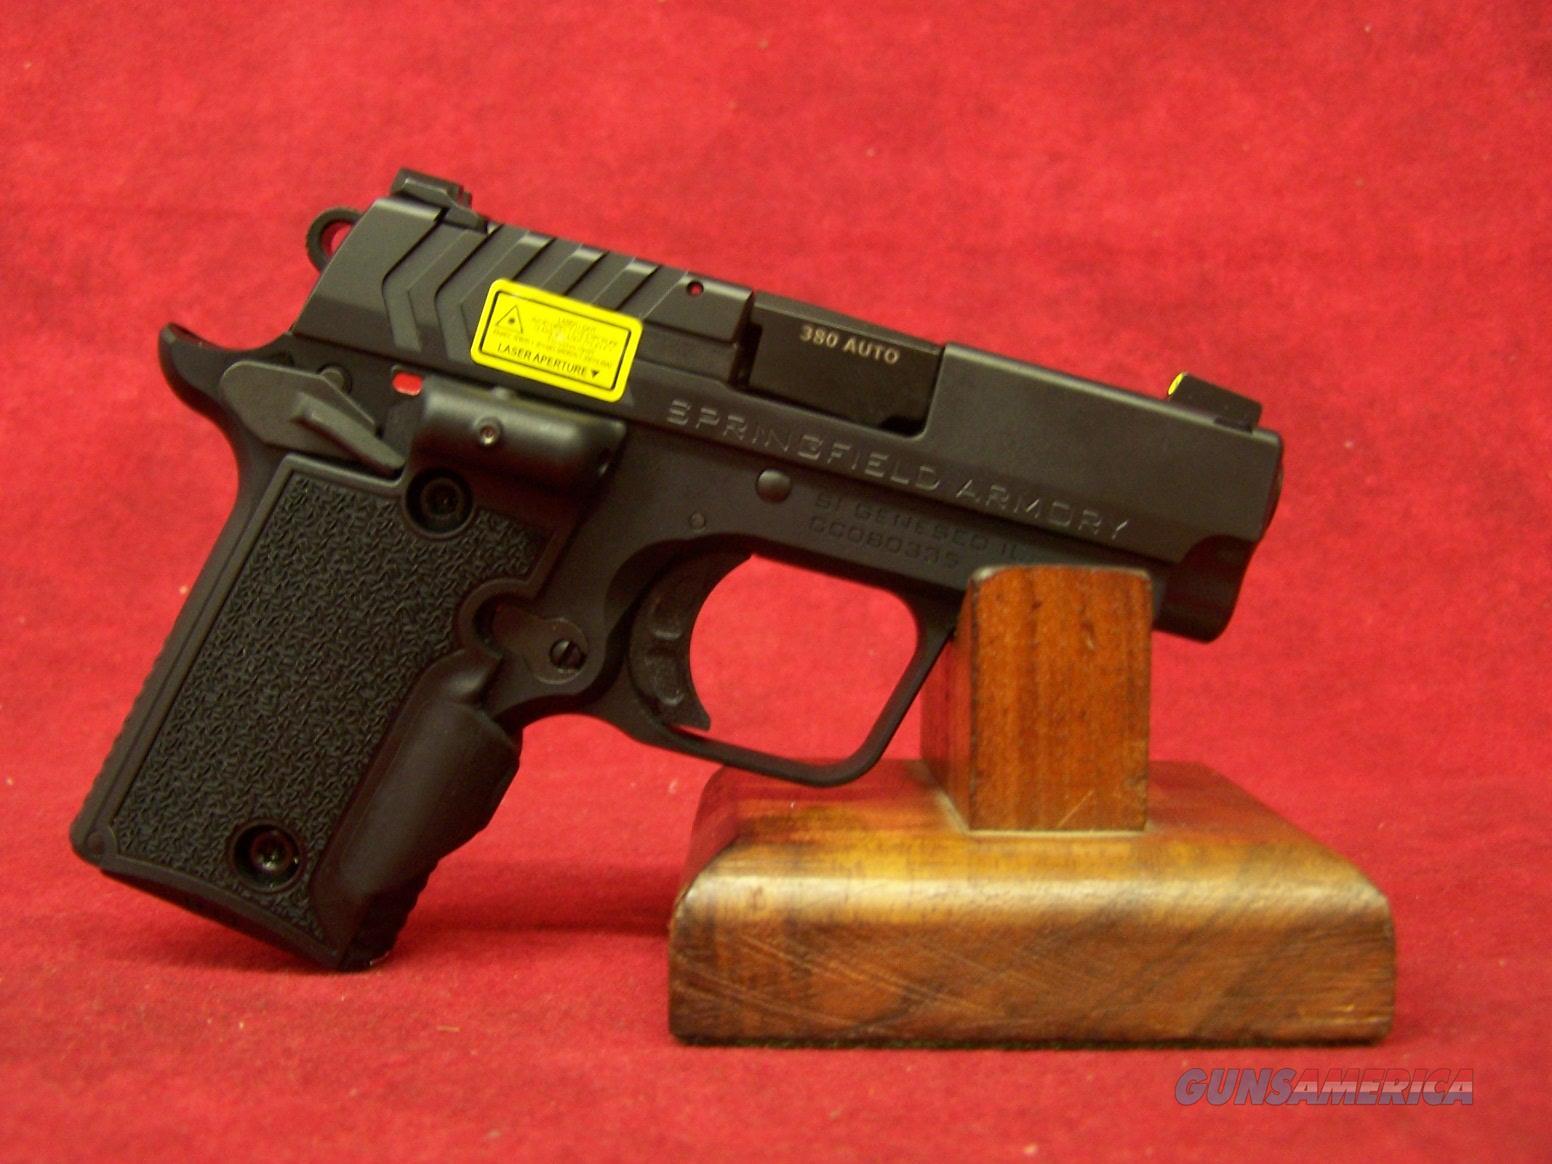 Springfield Armory 911 Black w/ Green Laser .380 ACP (PG9109VG)  Guns > Pistols > Springfield Armory Pistols > 911